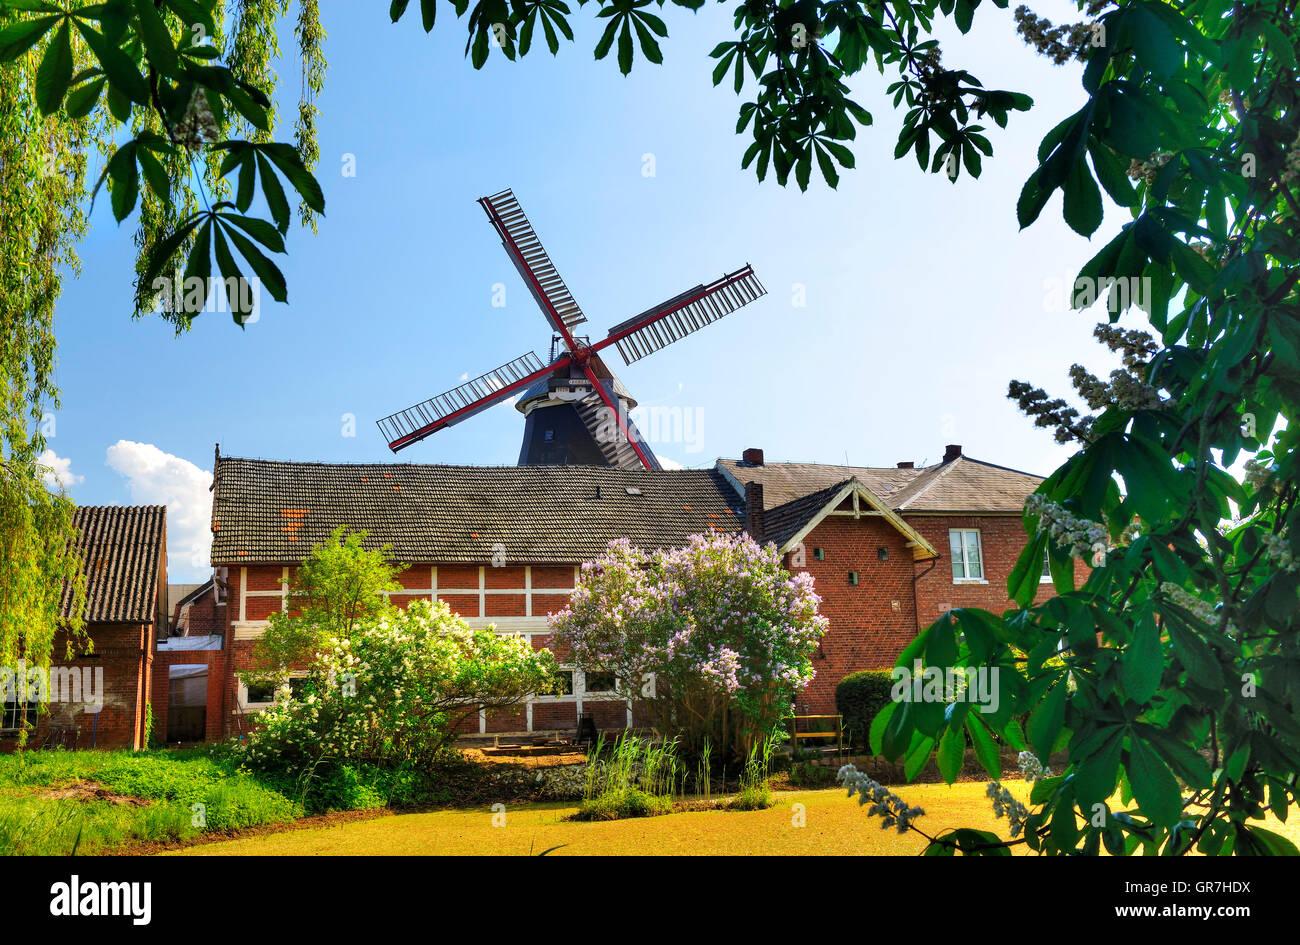 Windmill Boreas In Kirchwerder, Hamburg, Germany - Stock Image